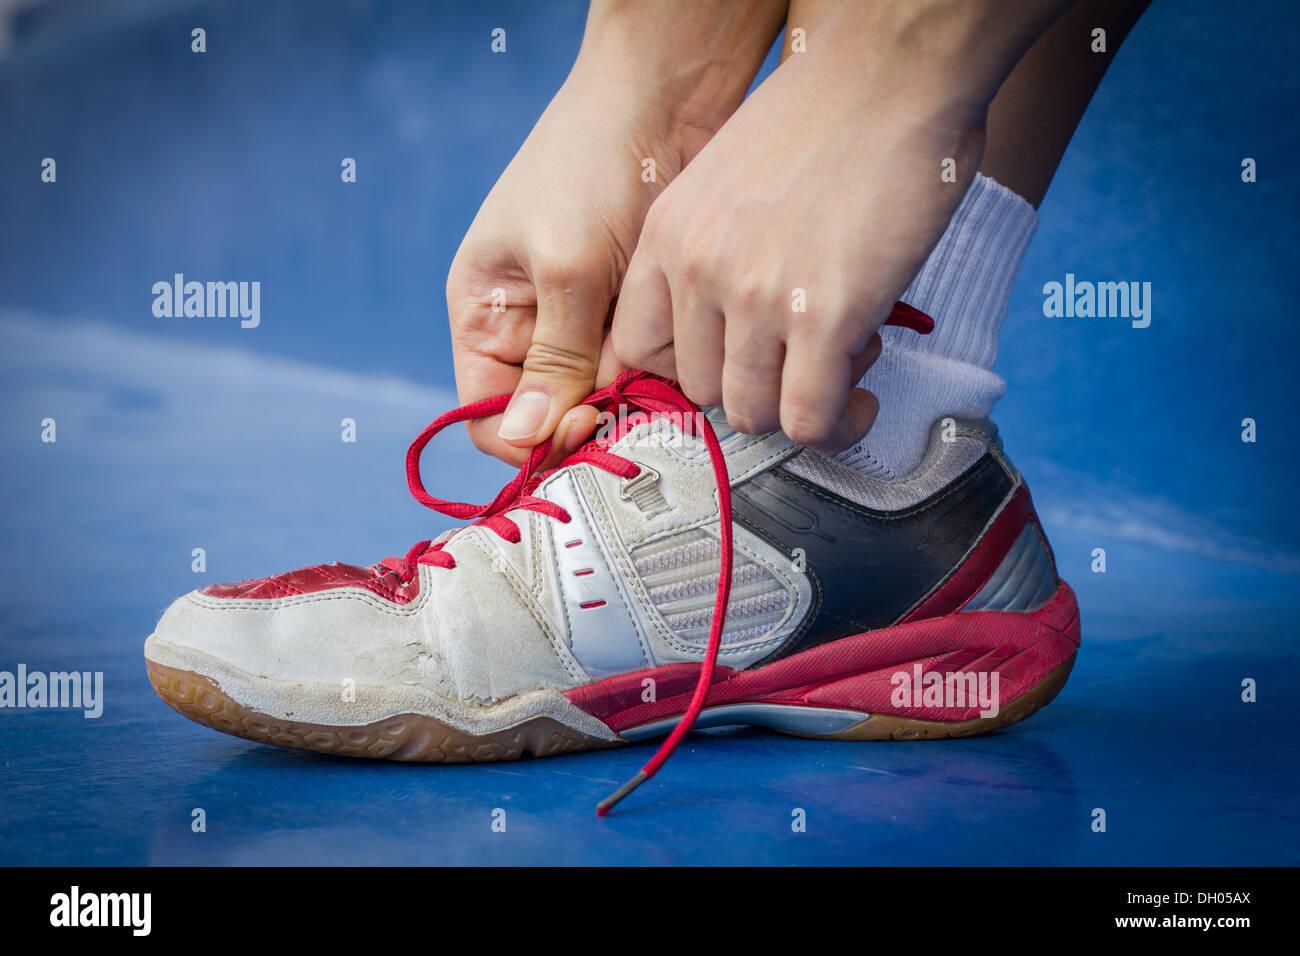 Attacher la chaussure de sport Photo Stock